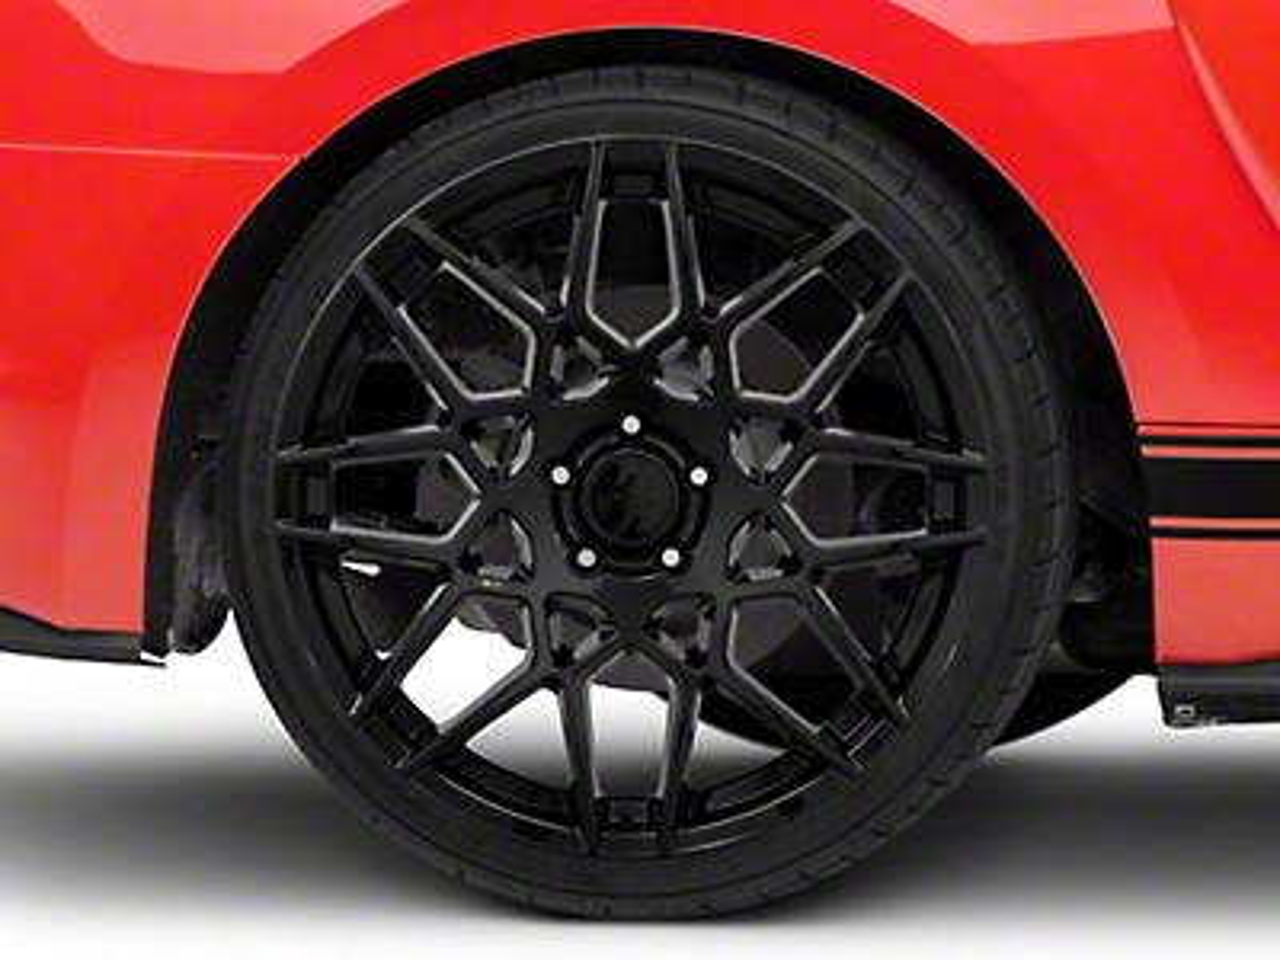 2013 GT500 Style Gloss Black Wheel - 20x10 (15-18 GT, EcoBoost, V6)